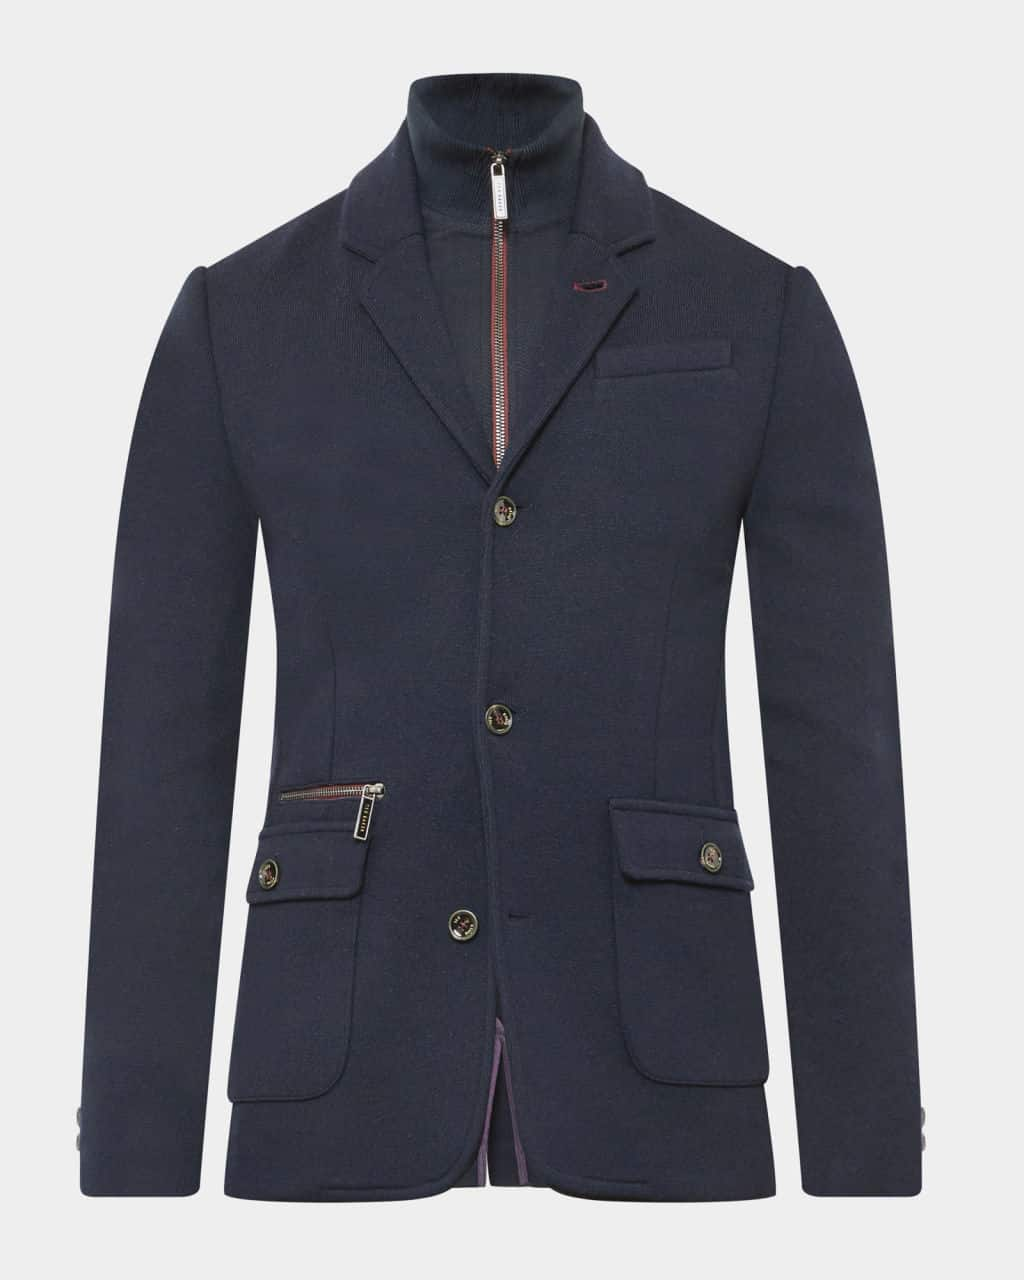 dom-funnel-neck-jersey-jacket-navy_ta6m_dom_10-navy_6_jpg